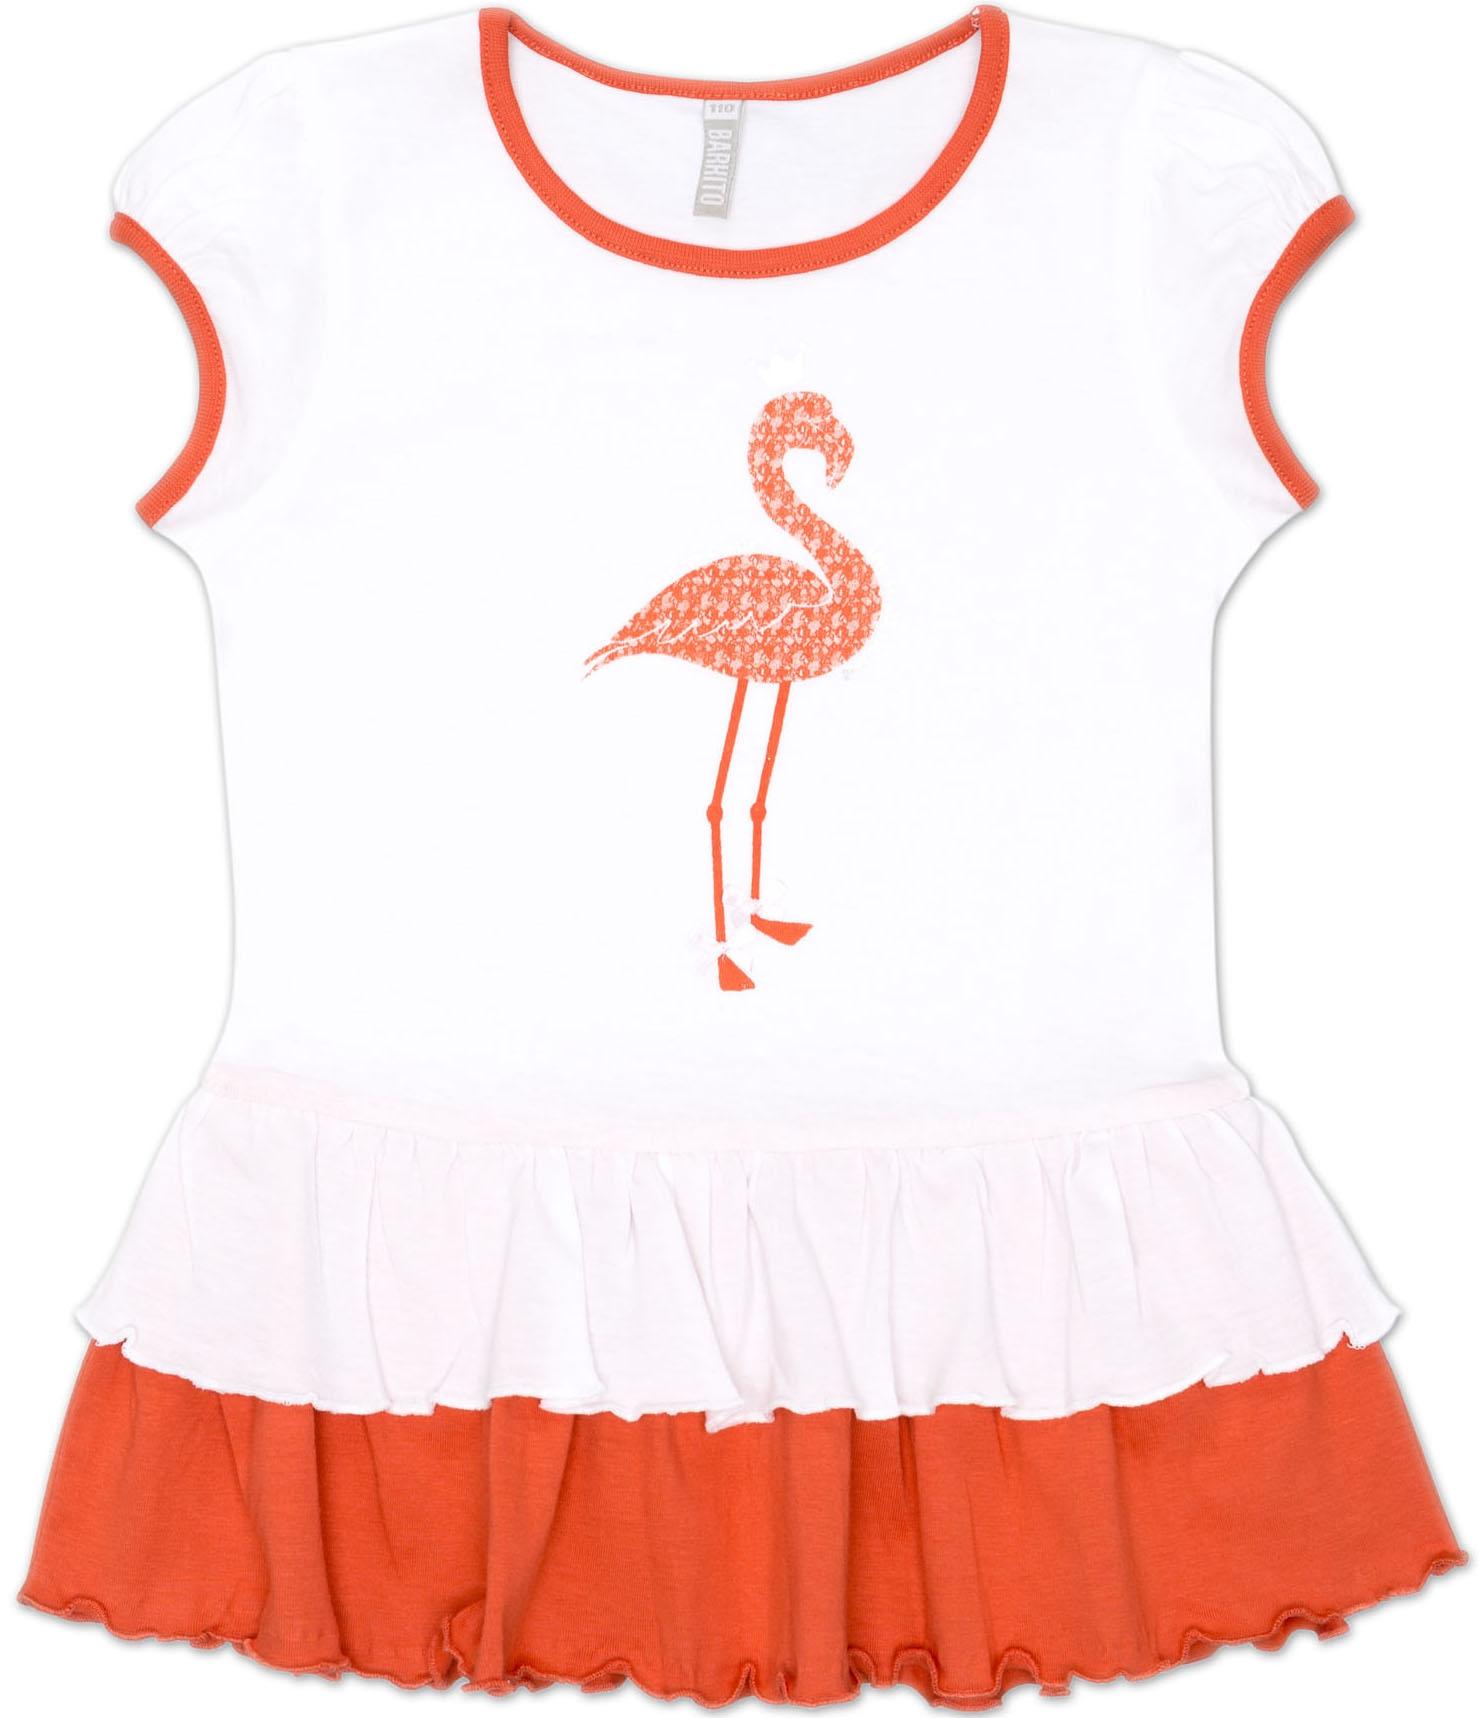 Блузки и туники Barkito Туника трикотажная с коротким рукавом для девочки Barkito, Фламинго, бело-оранжевая